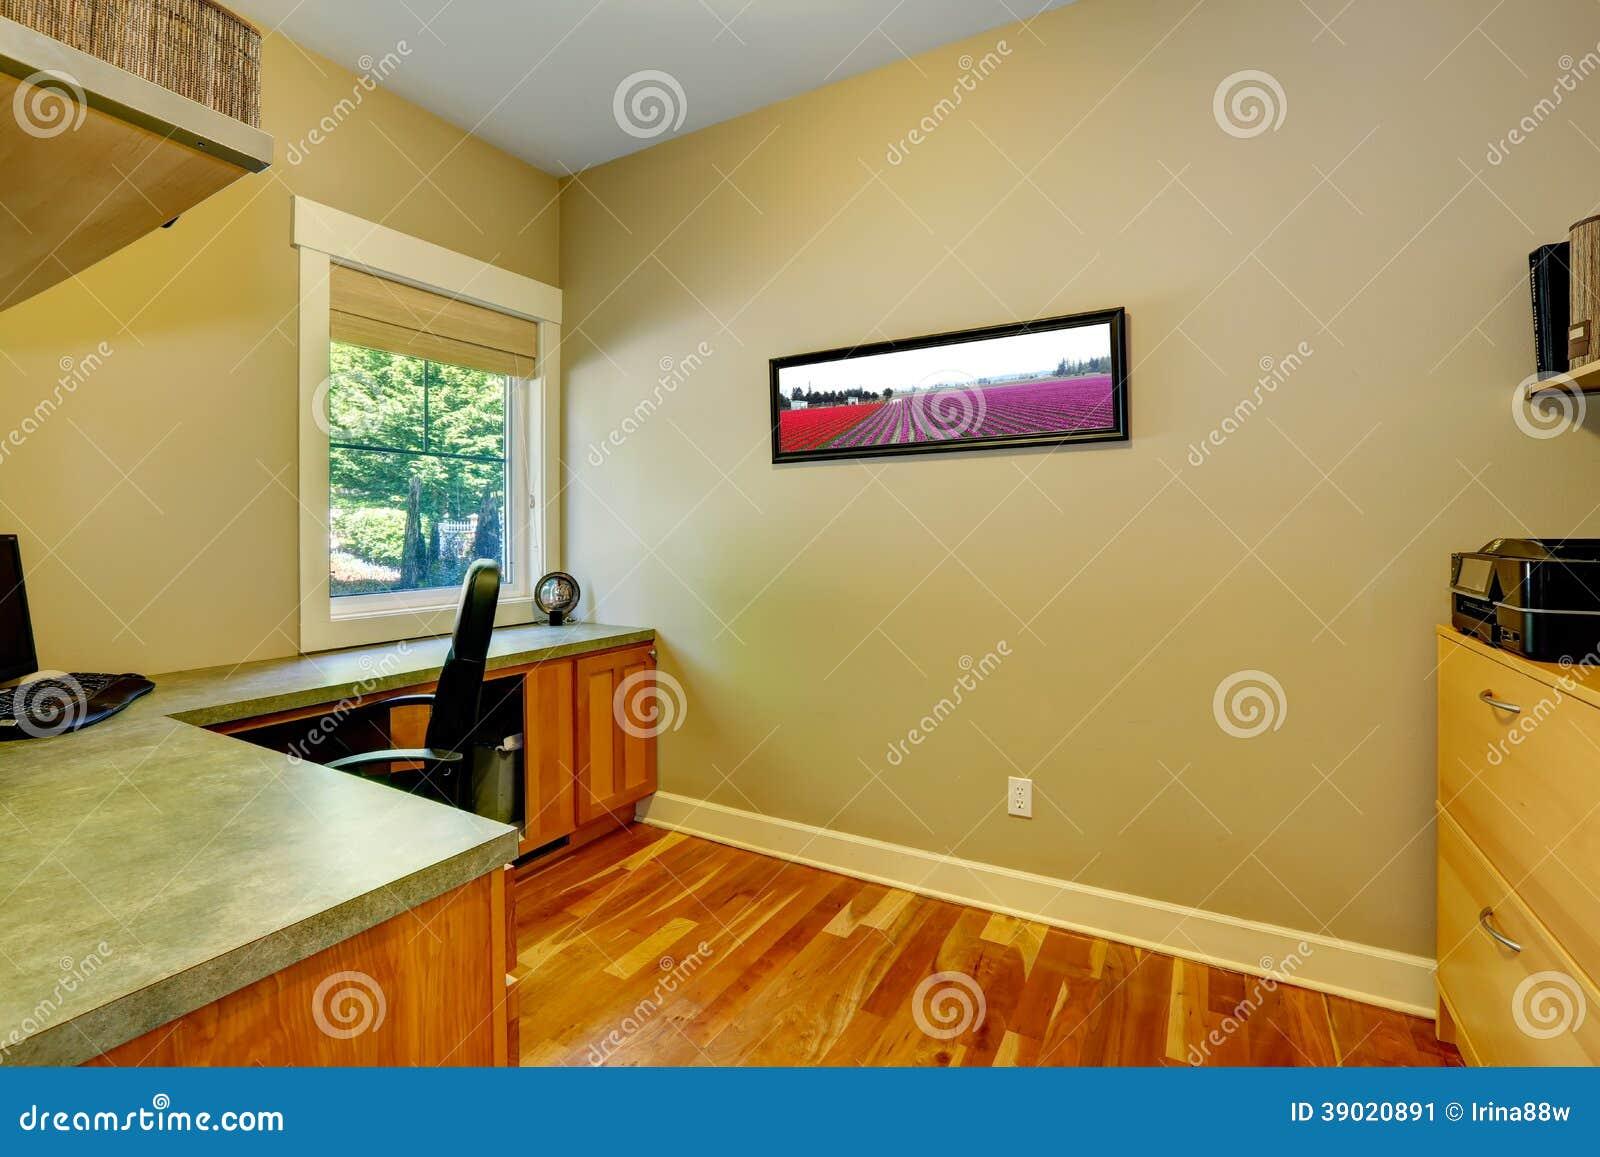 Office design interior stock image. Image of décor, idea - 39020891